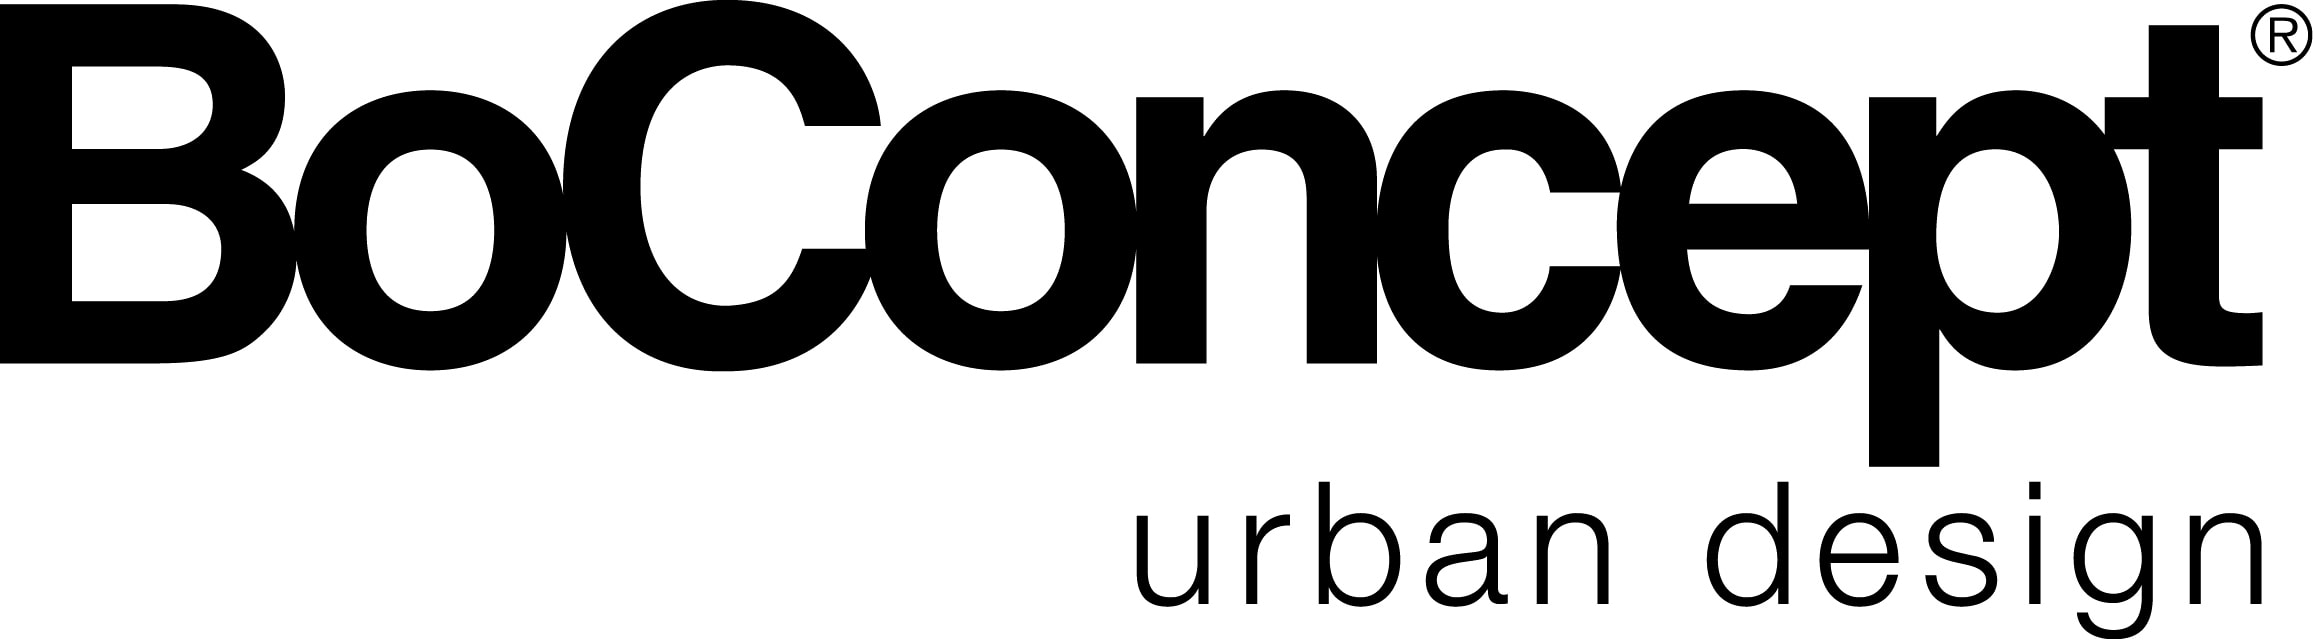 Boconcept crossover marketing hannover netzagentur for Bo concept plan de campagne